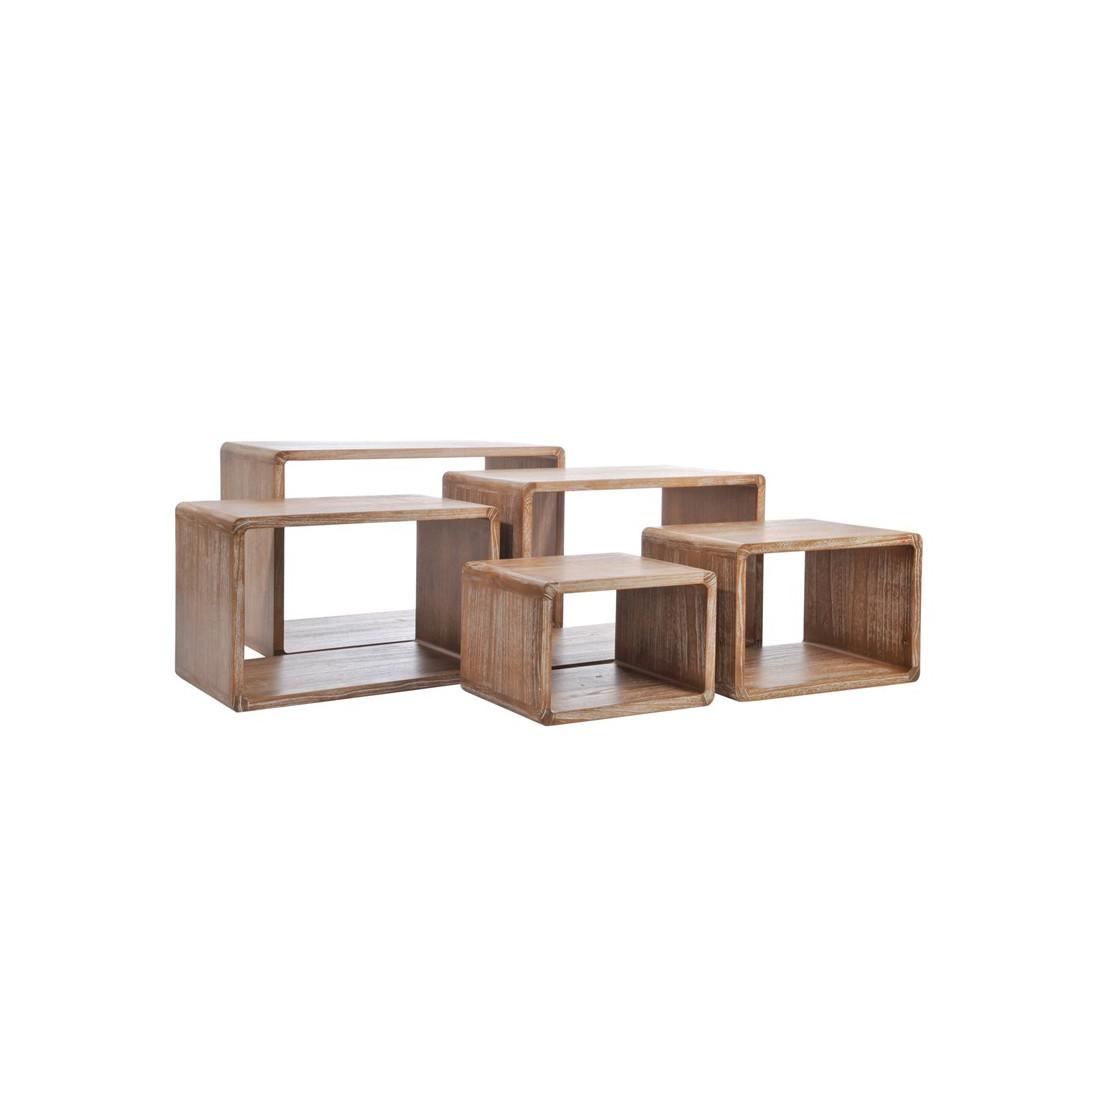 set de 5 tables gigognes bois naturel girolle univers petits meubles tousmesmeubles. Black Bedroom Furniture Sets. Home Design Ideas